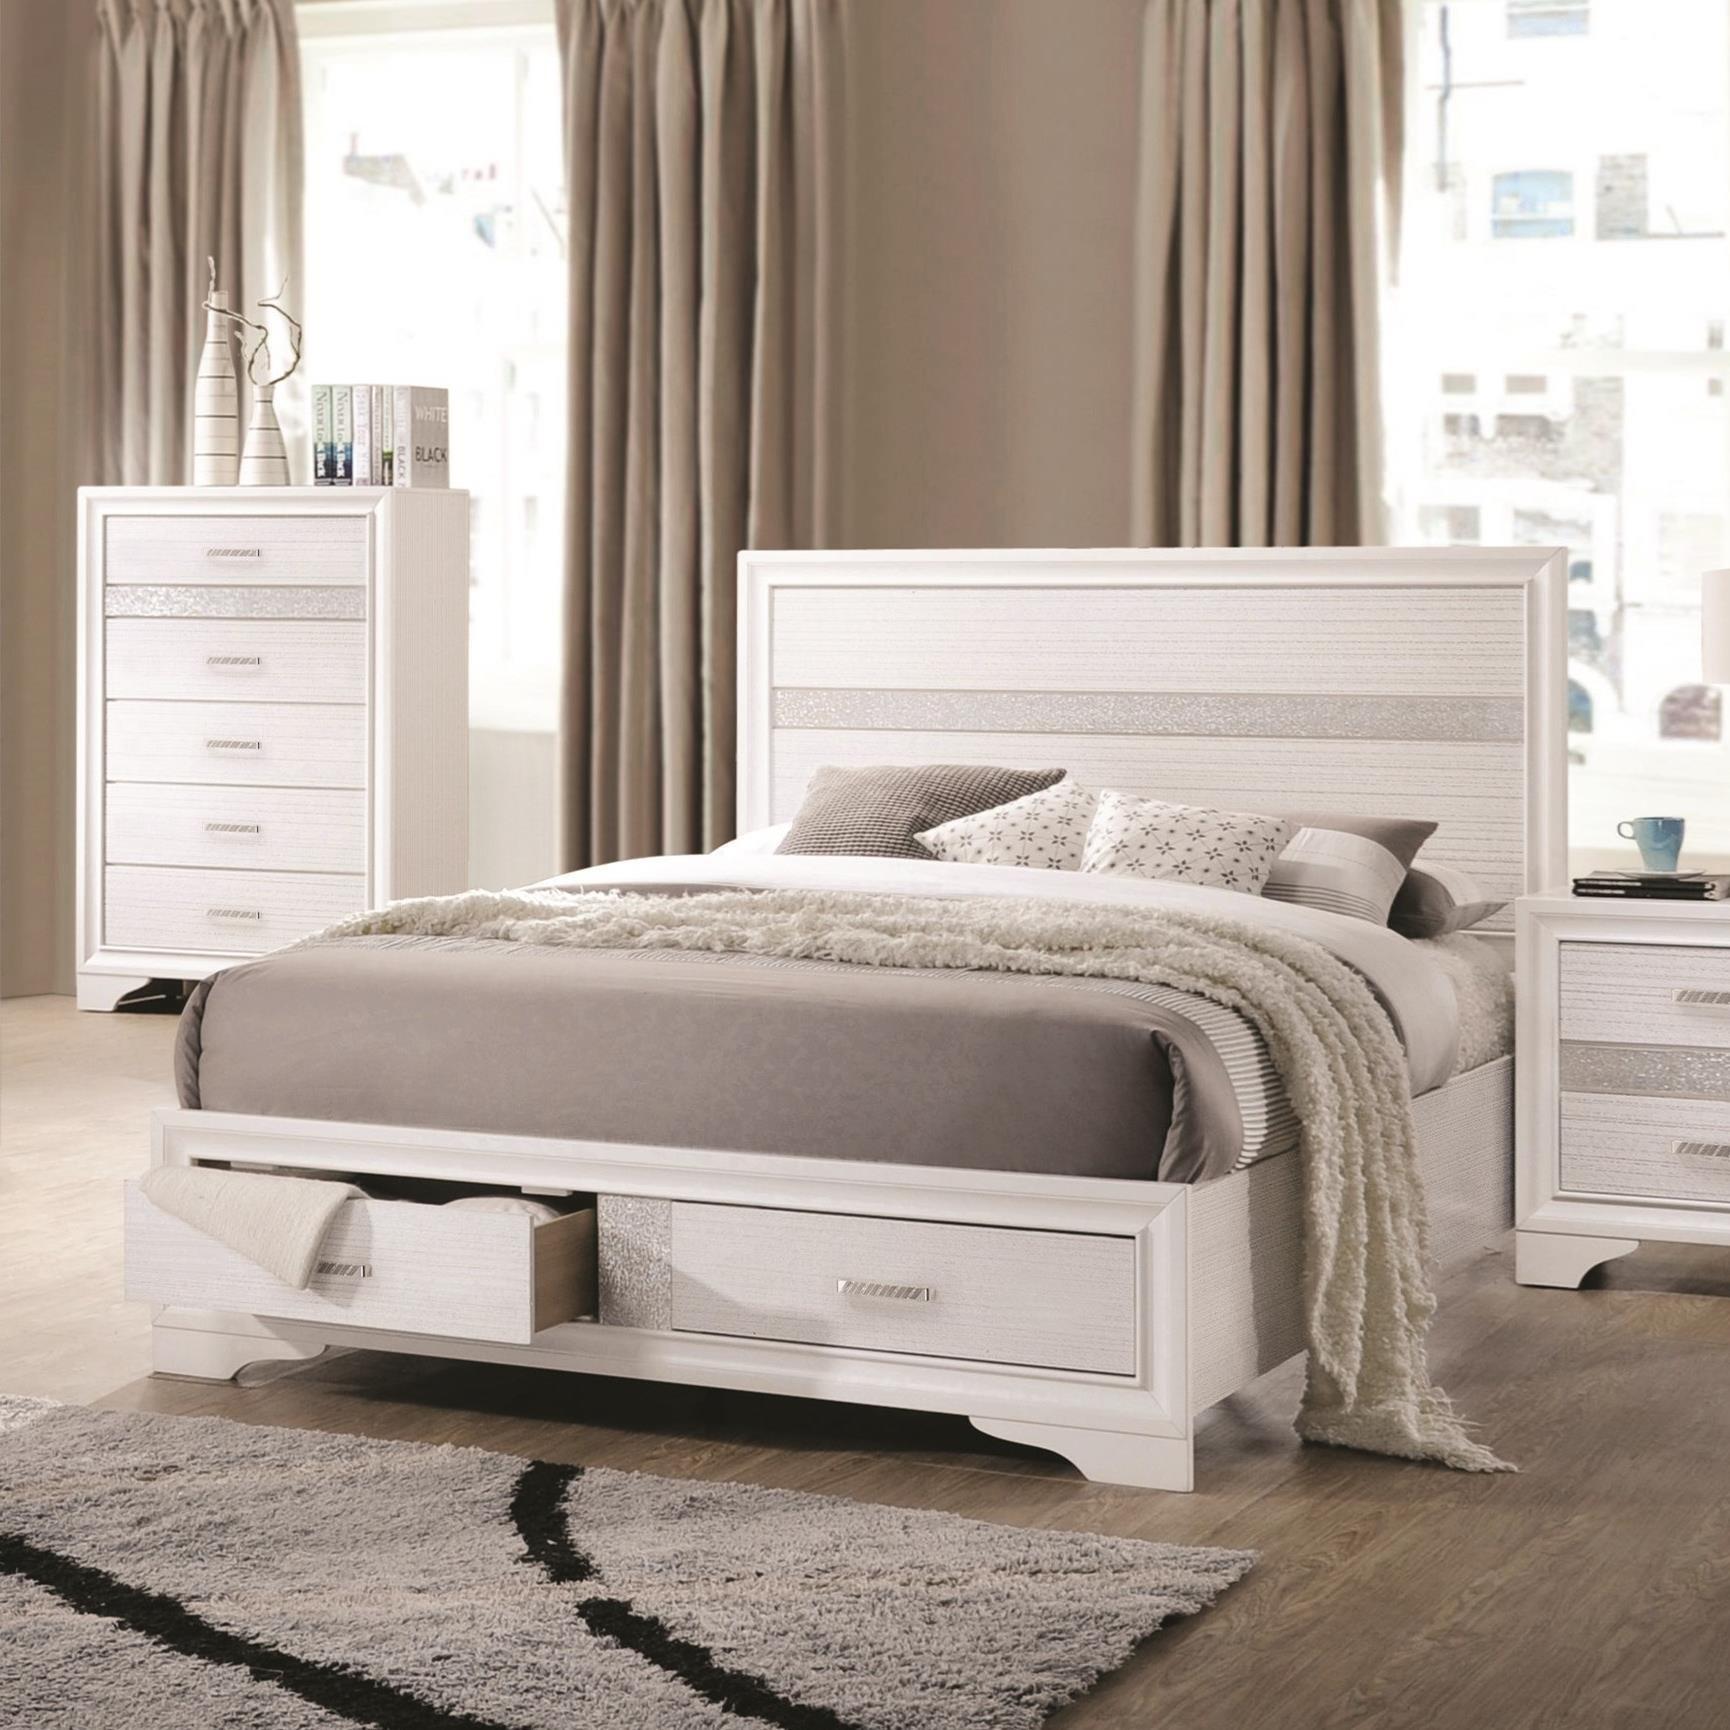 Coaster Miranda King Storage Bed - Item Number: 205111KE